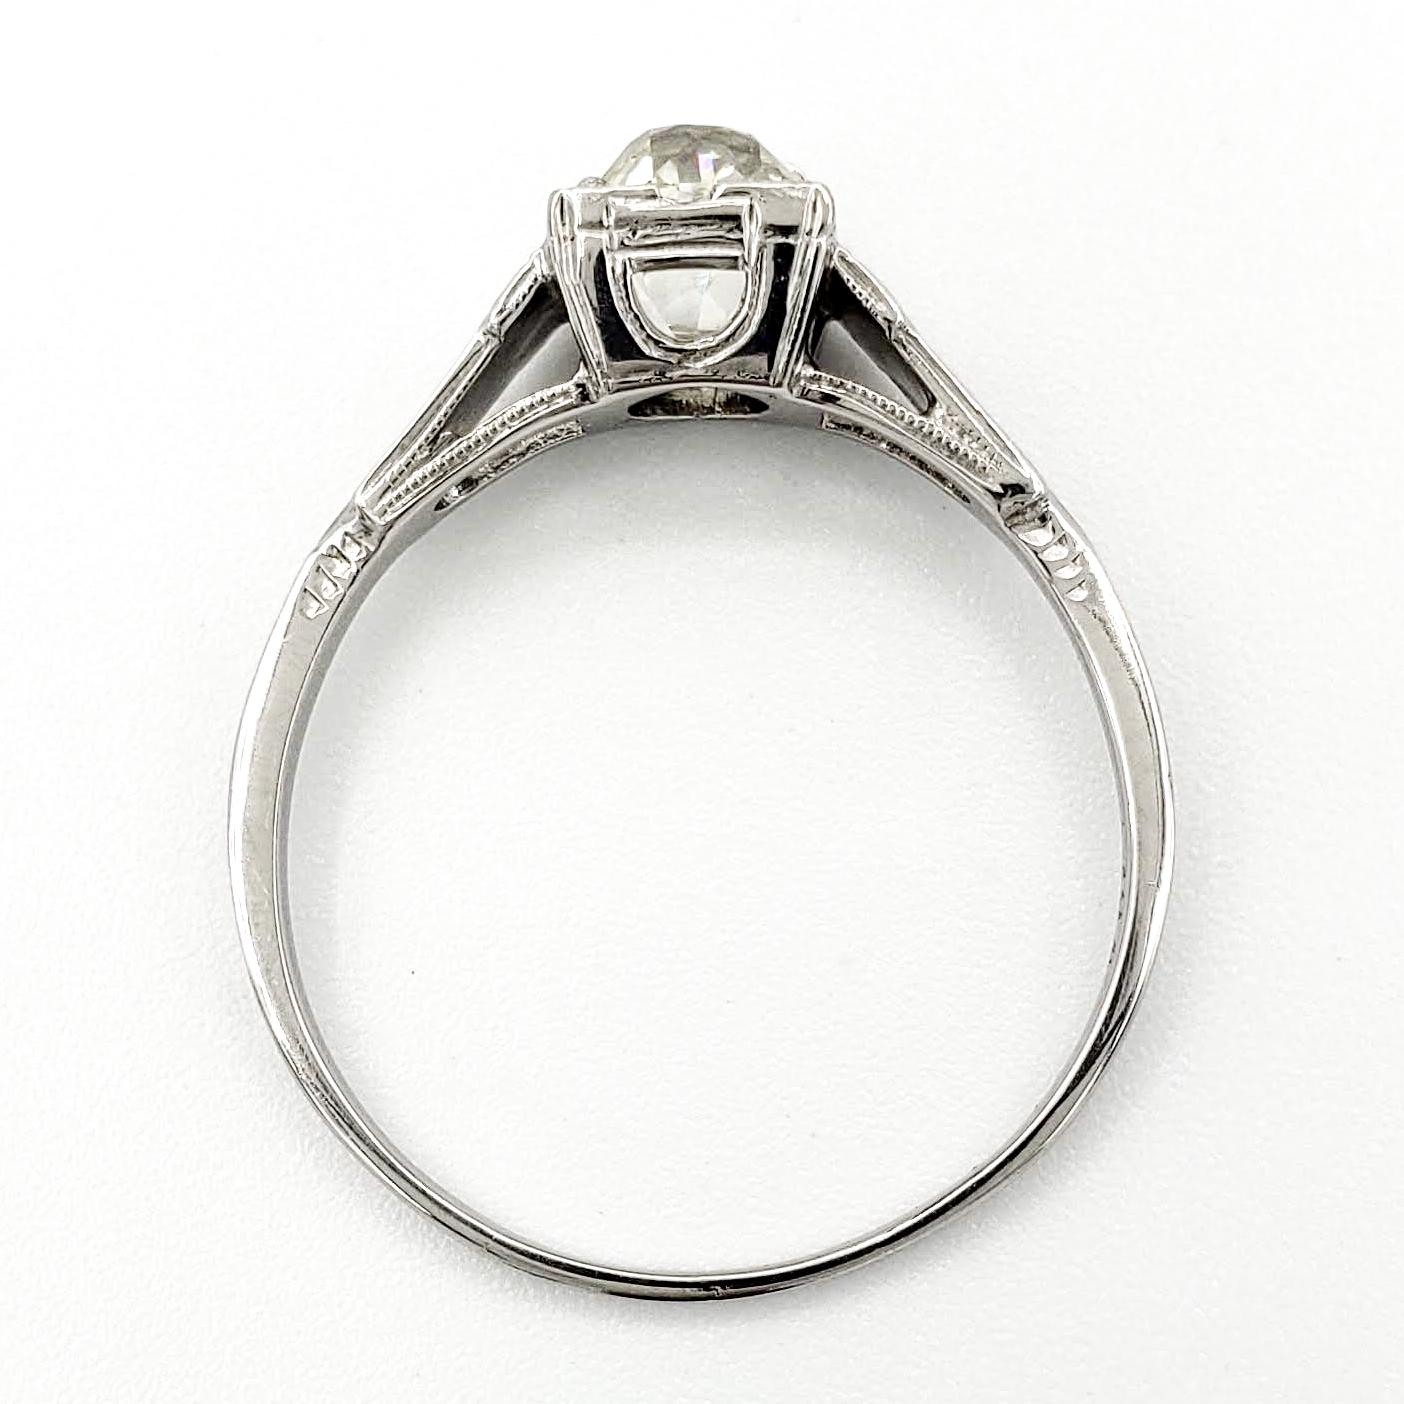 vintage-18-karat-gold-engagement-ring-with-1-00-carat-old-mine-cut-diamond-egl-k-vs2